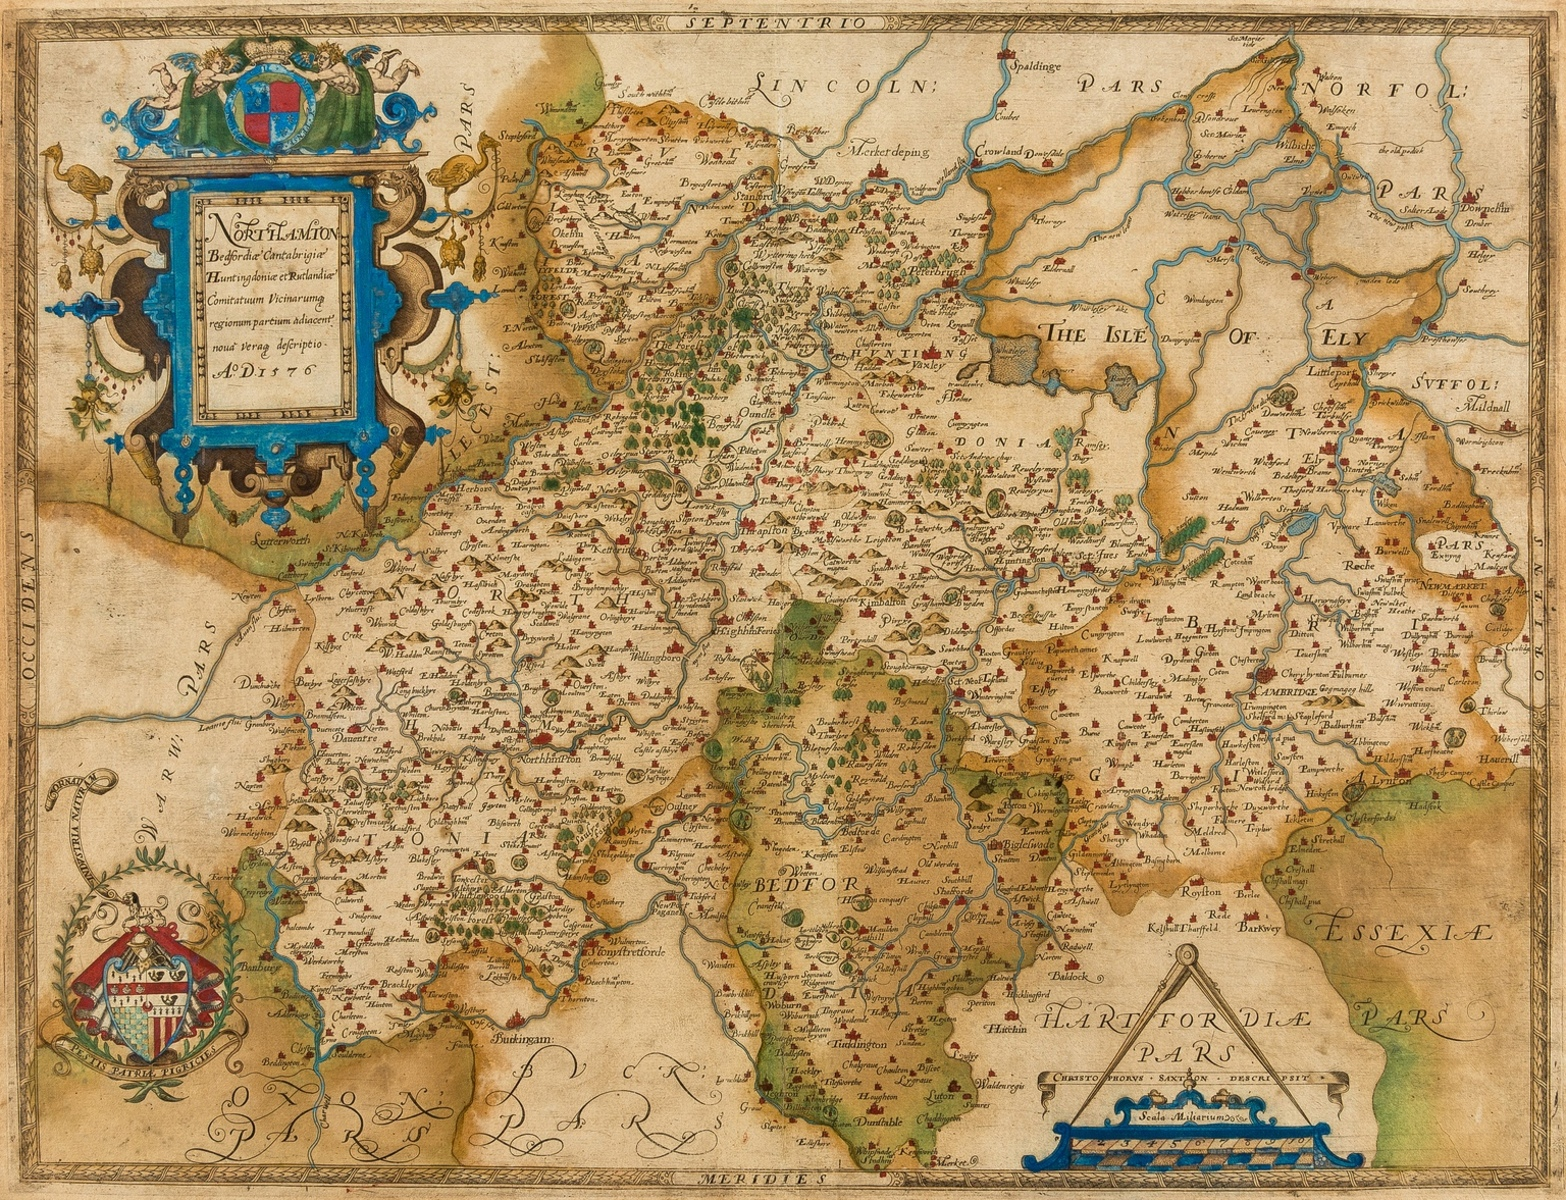 Northampton.- Saxton (Christopher) Northamton Bedfordiae, Cantabrigiae, Huntingdoniae et …